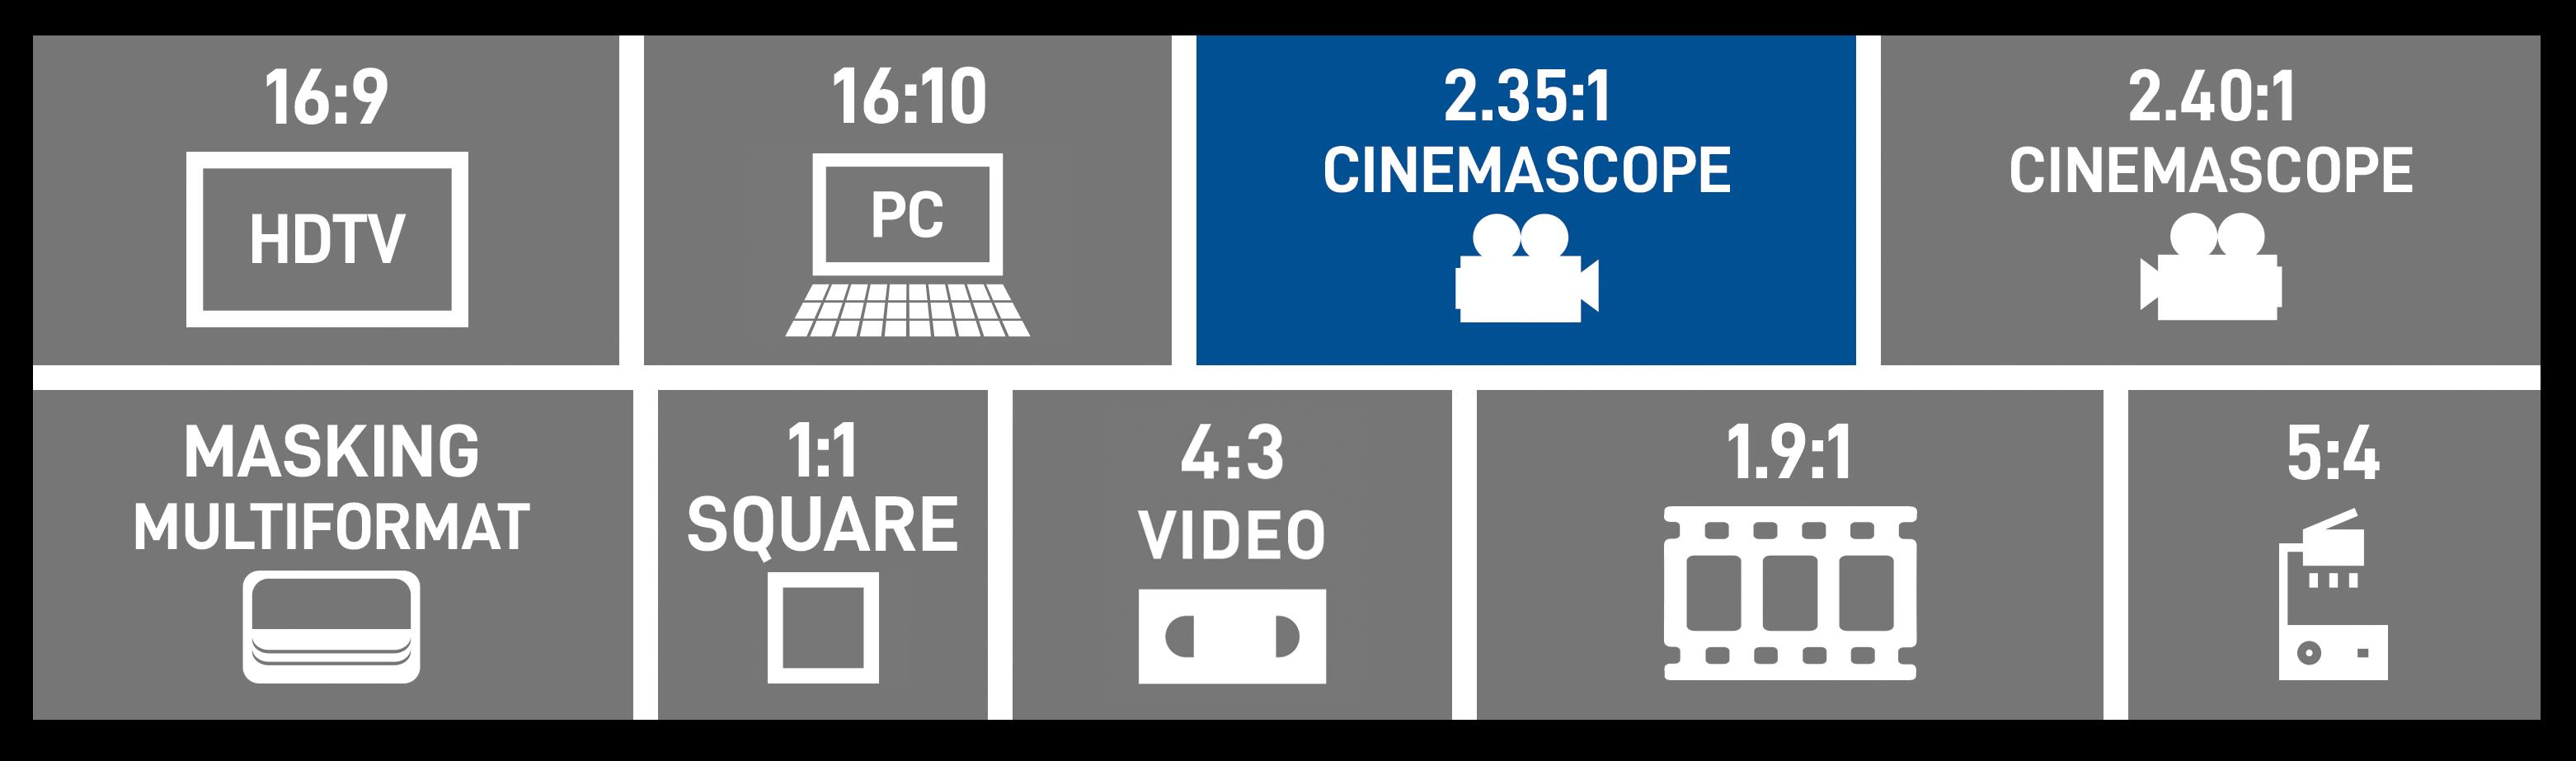 2.35:1 Cinemascope Format